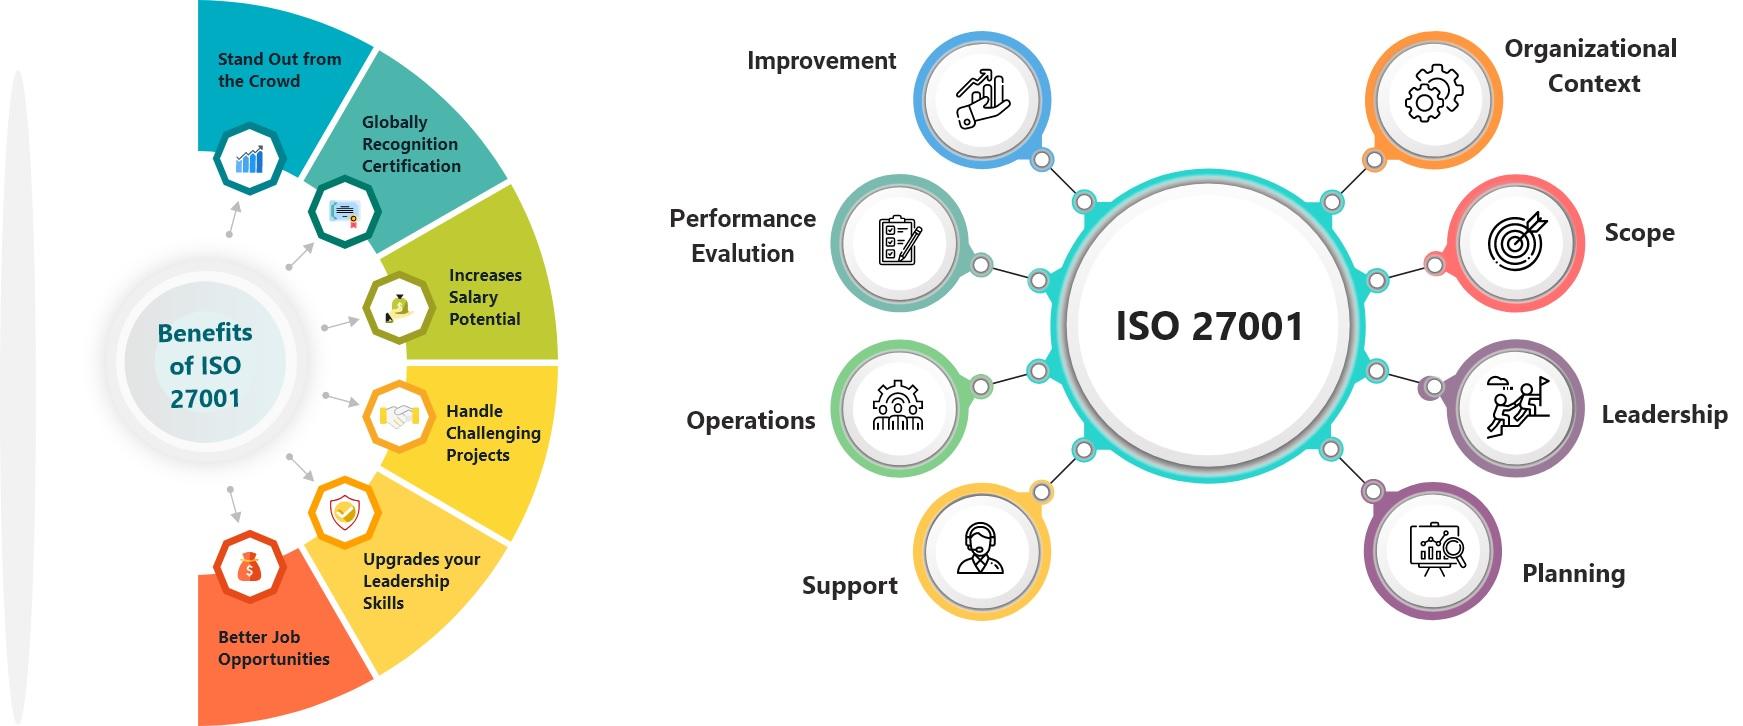 img4-iso-iec-27001-introduction.jpg